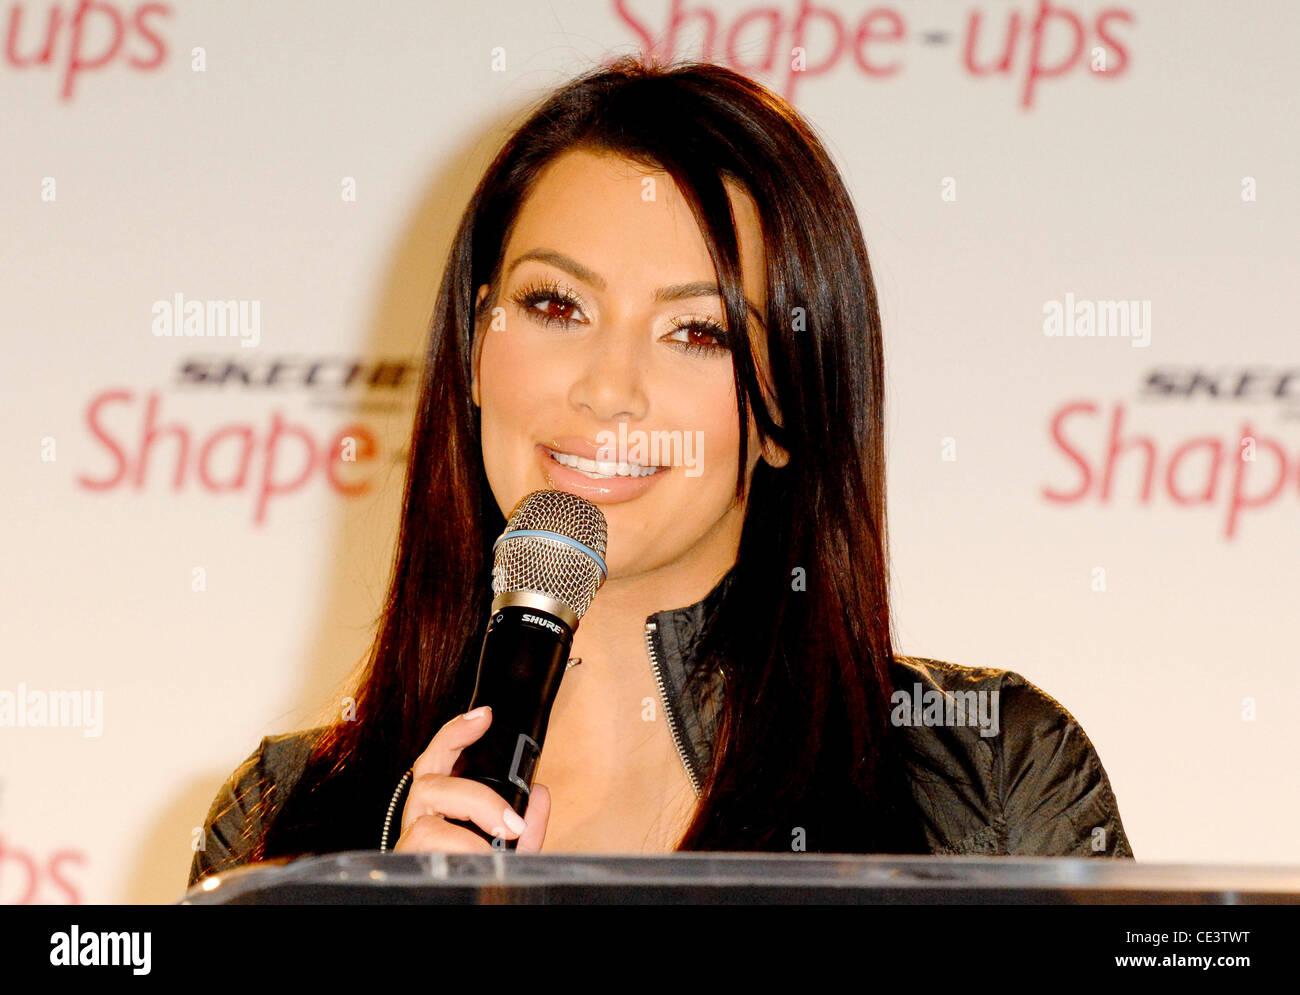 Skechers Shape Ups Announces Global Partnership With Kim